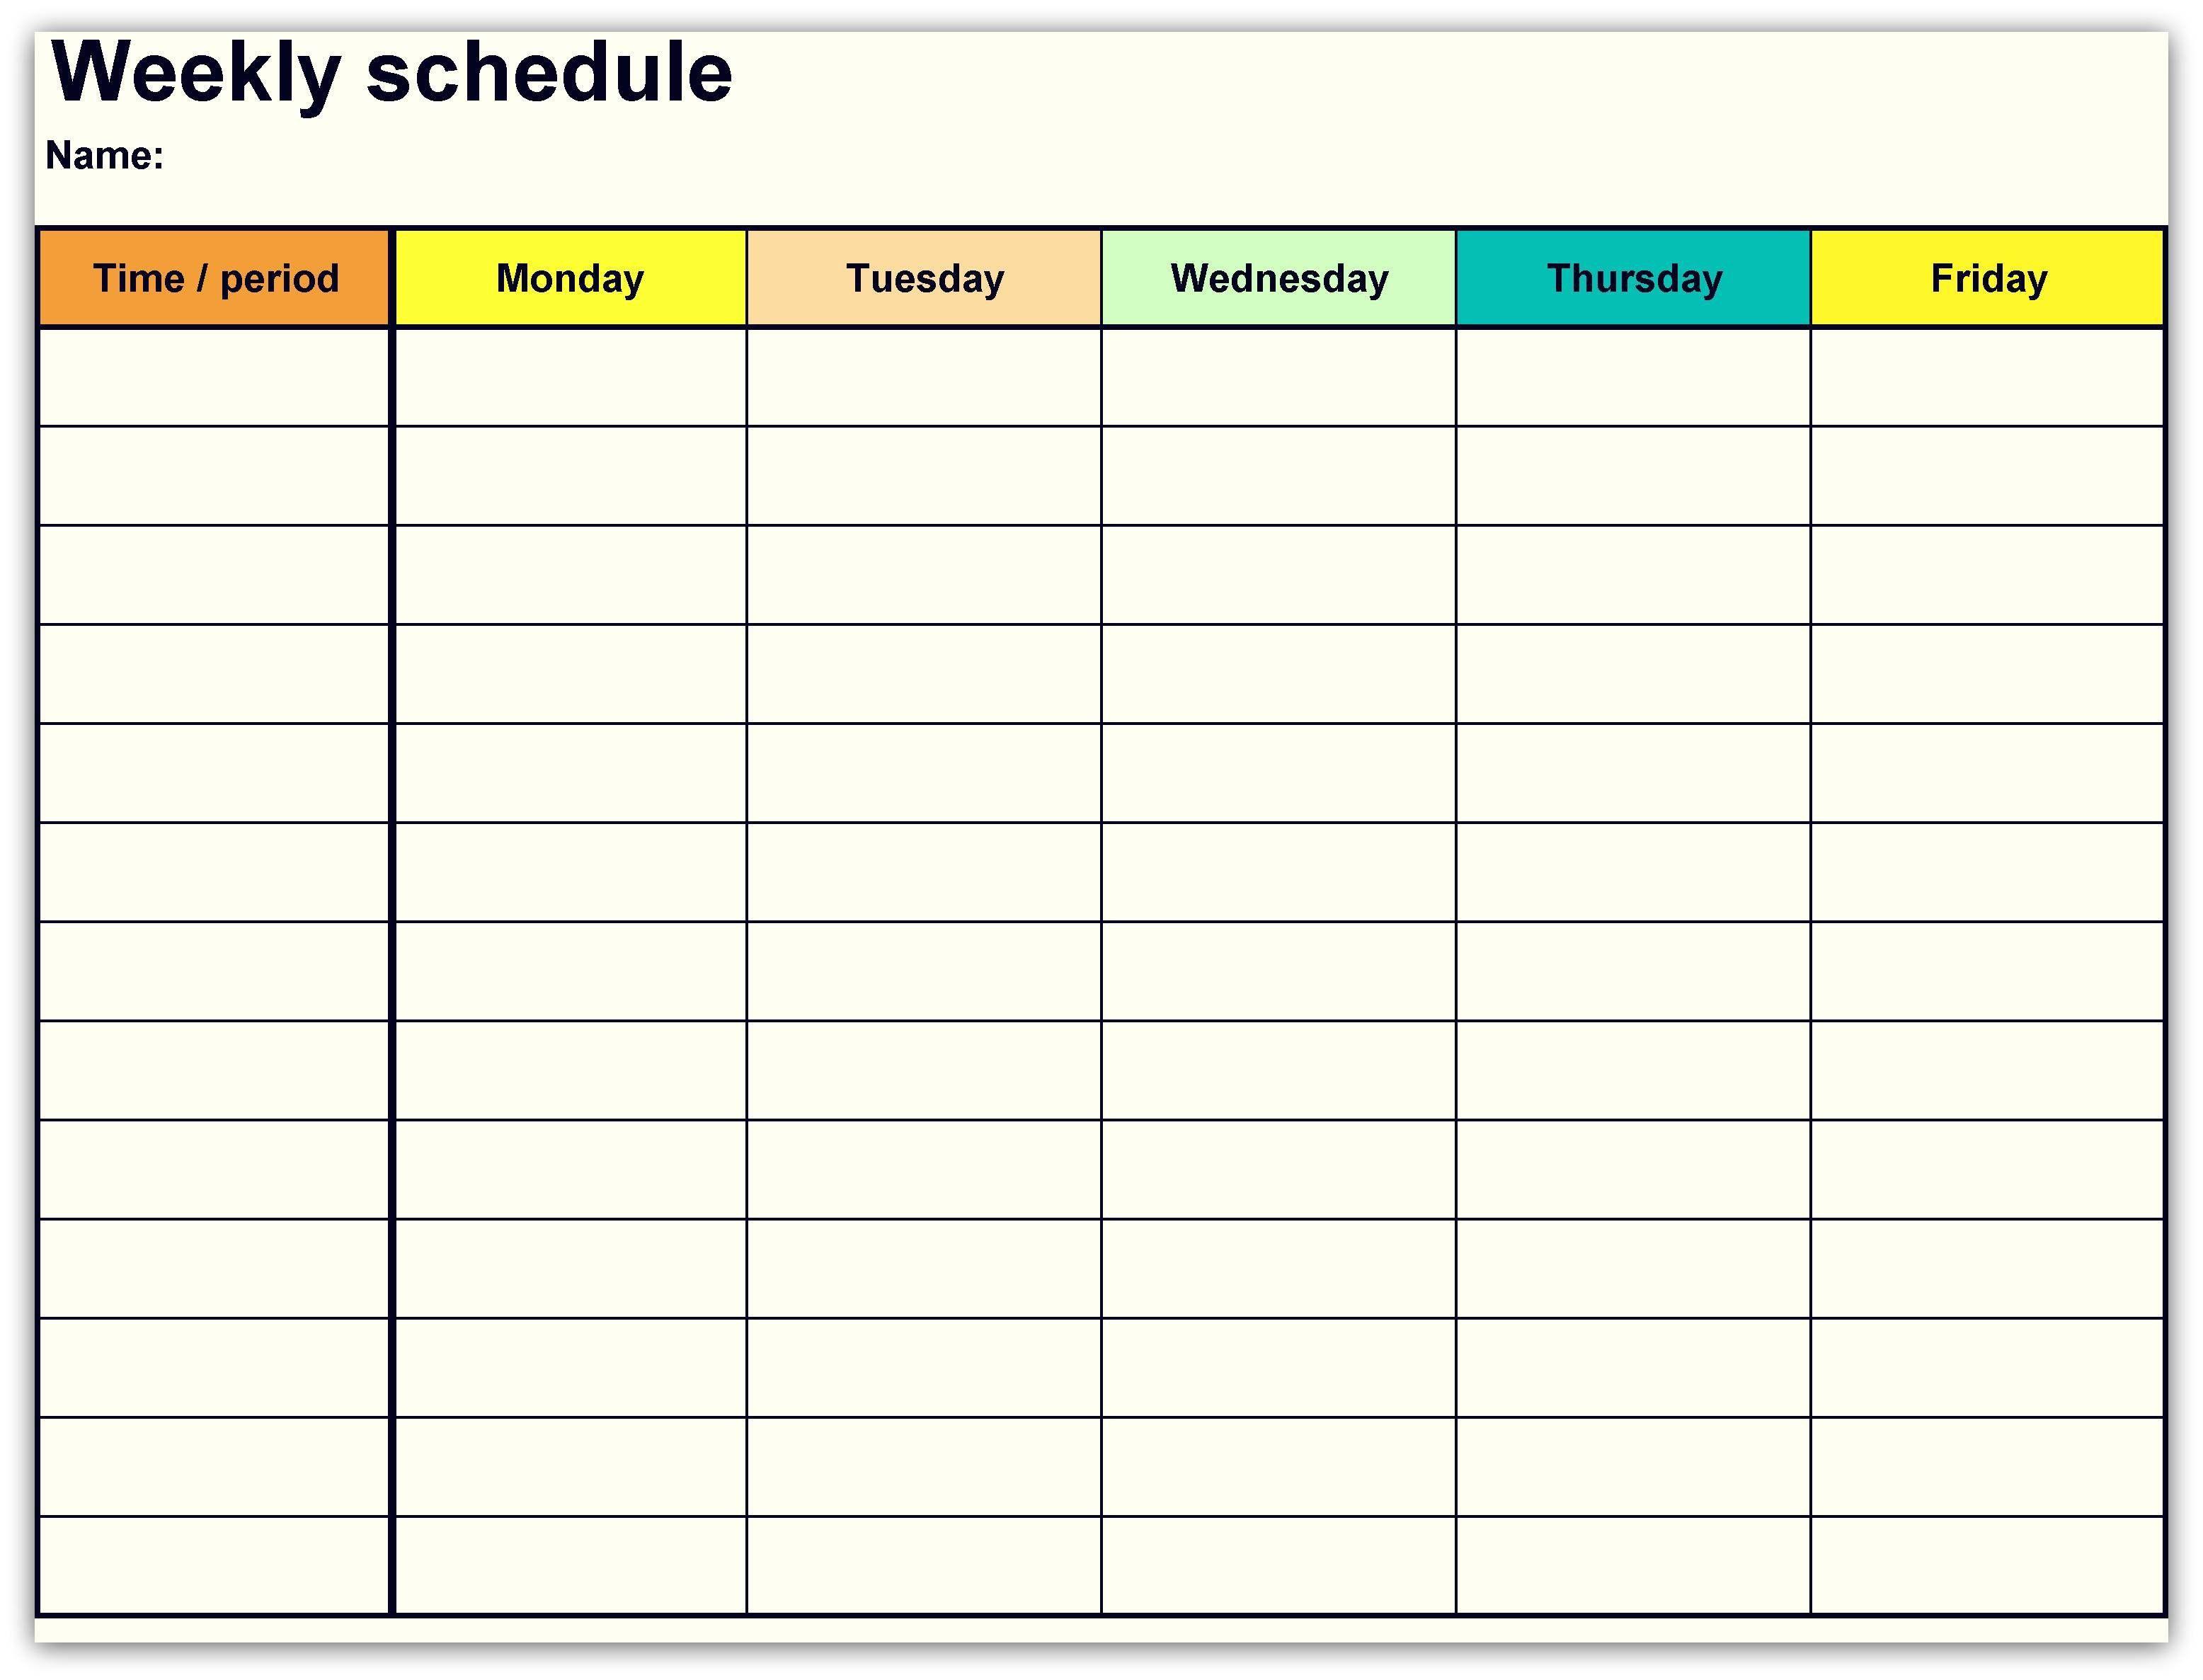 000 Imposing Calendar Template Google Doc Design  Docs Editable Two Week 2019-20Full